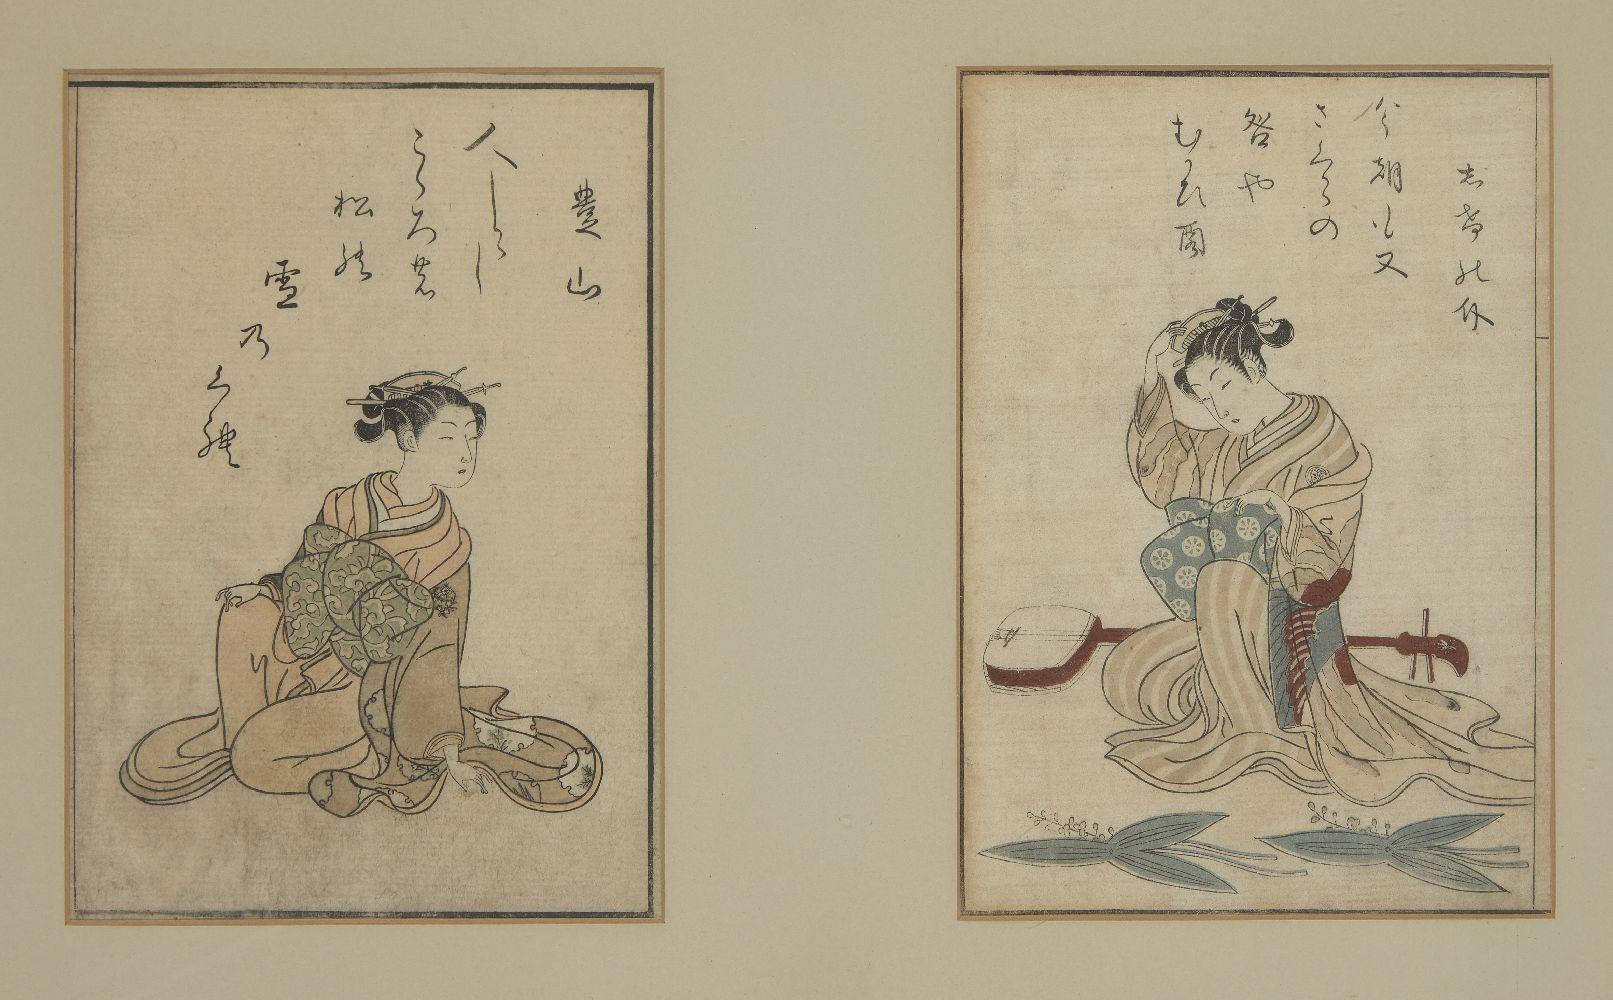 Suzuki Harunobu, Japanese c.1725-1770, two book plates from Ehon Seiro Awase, 1770, the left plate